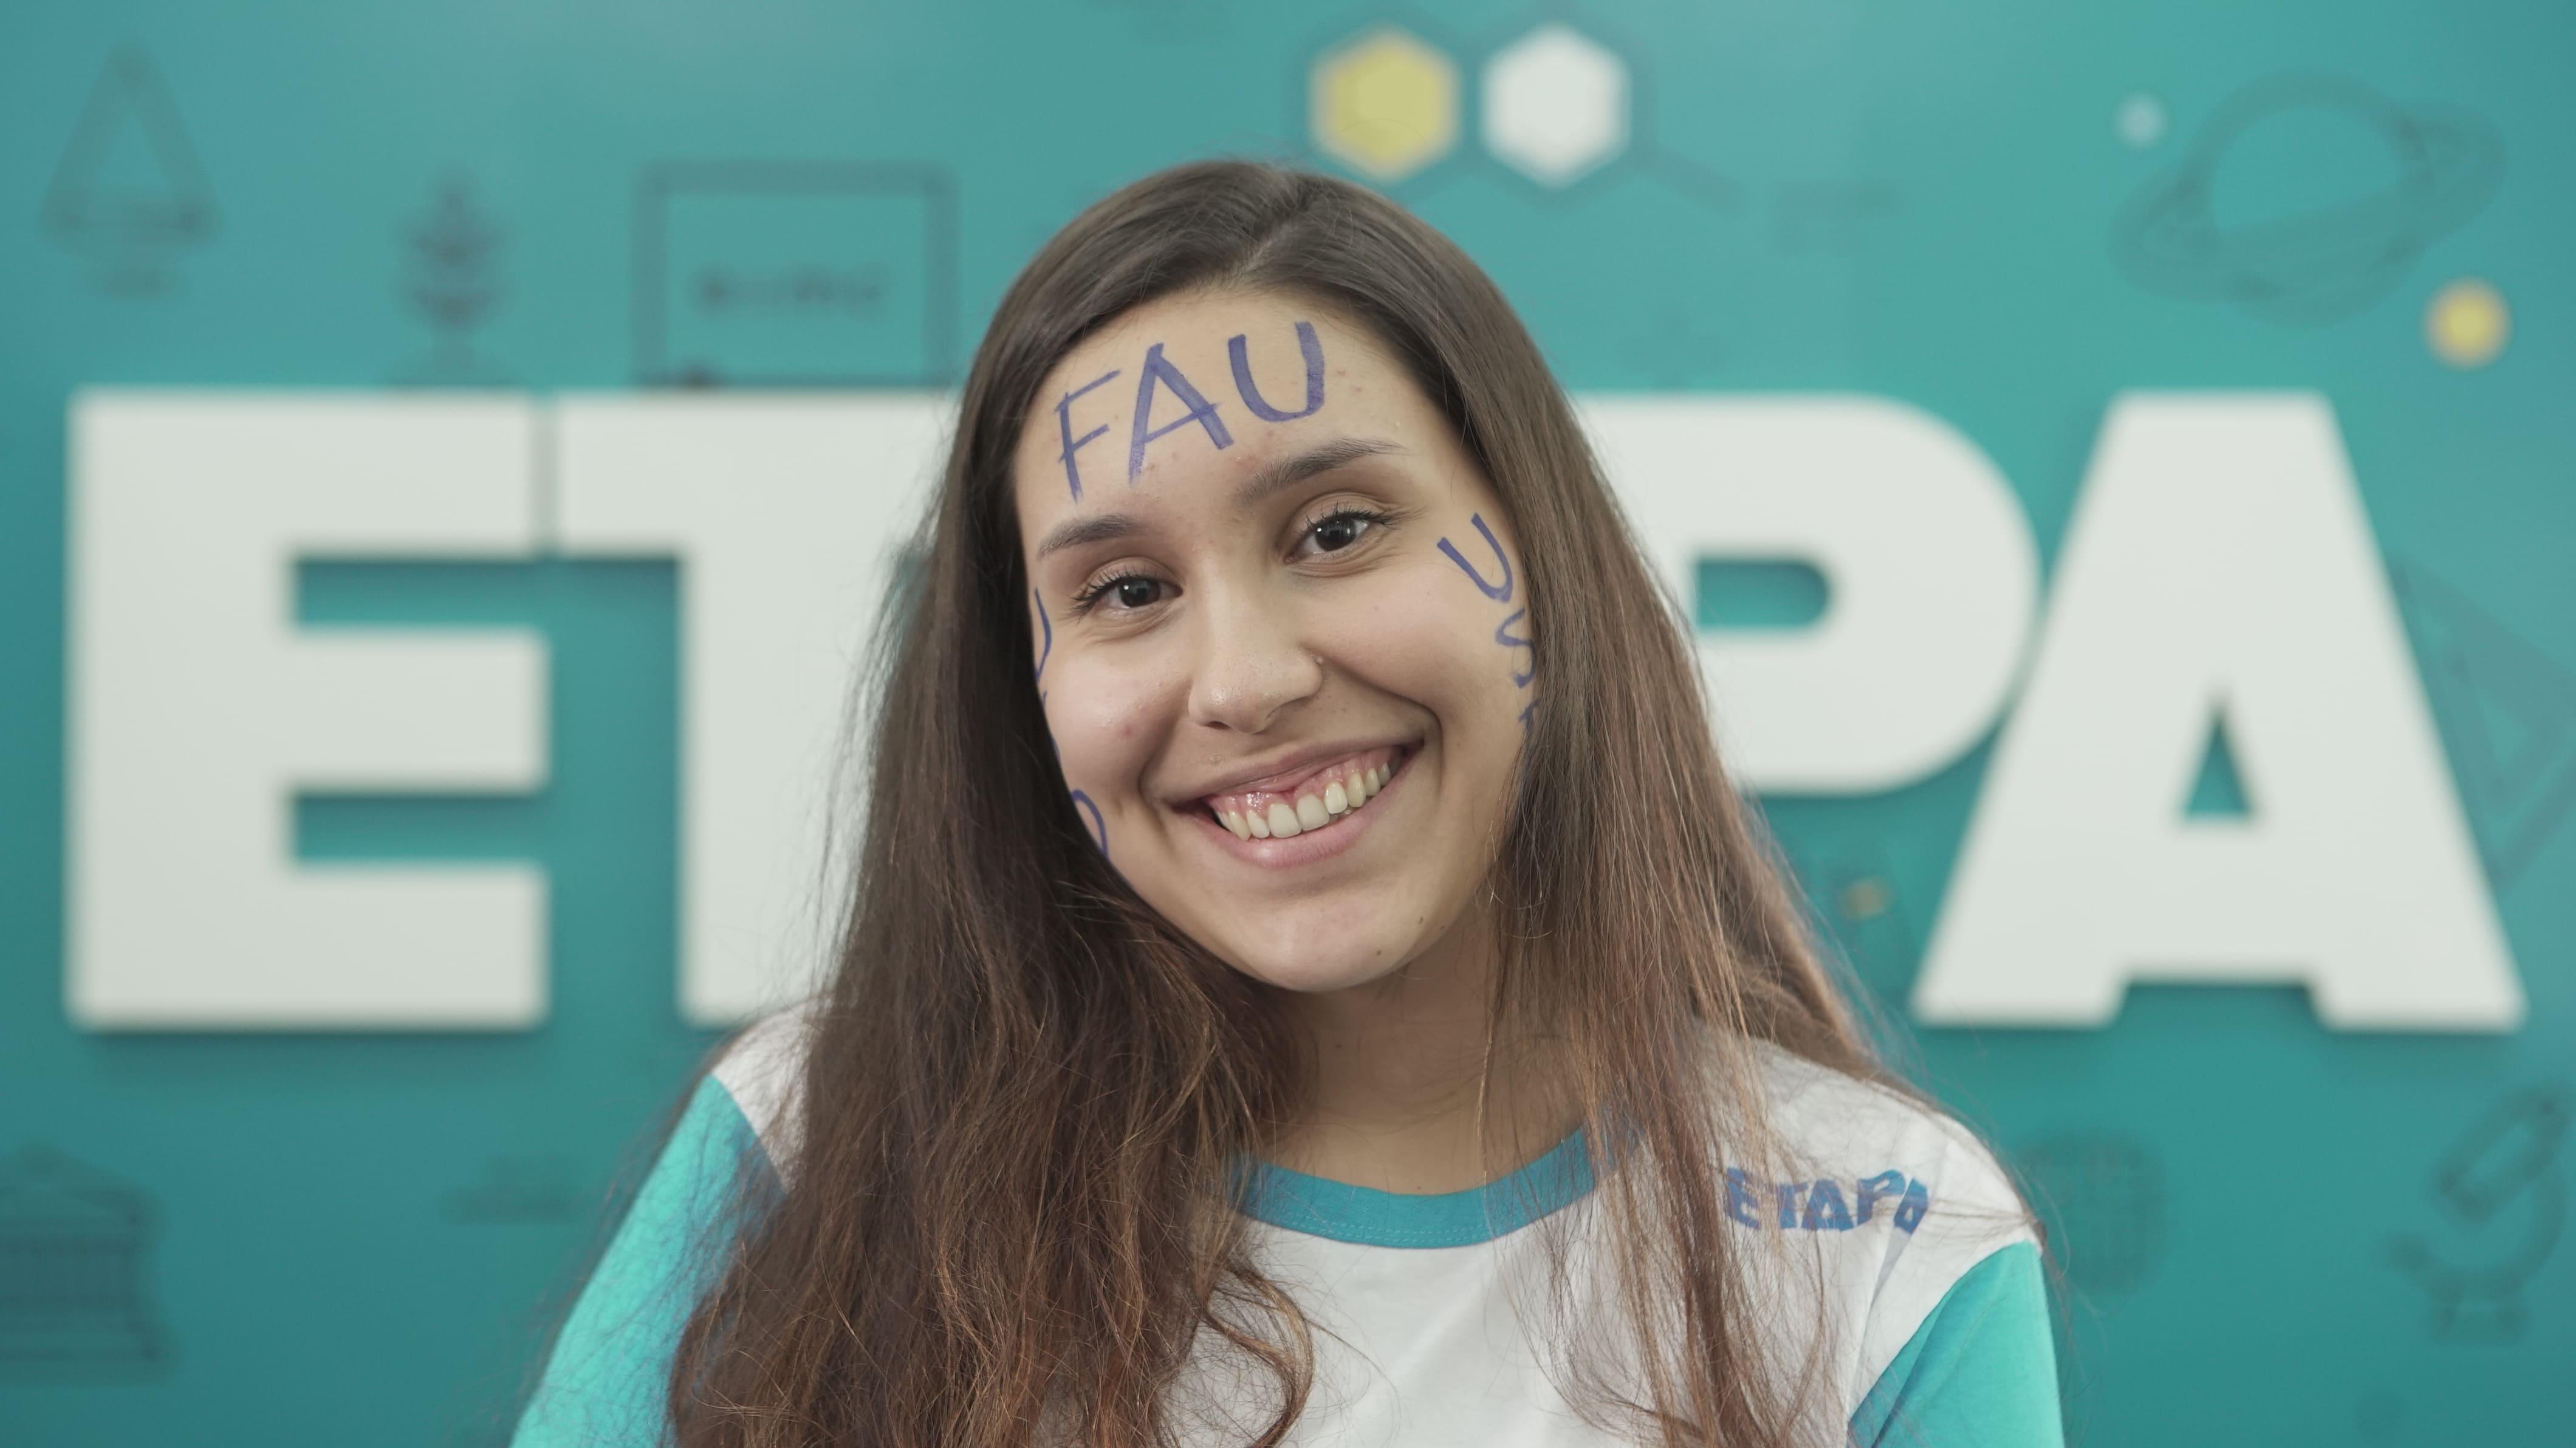 Histórias para inspirar: Rafaela Bessi Martinez